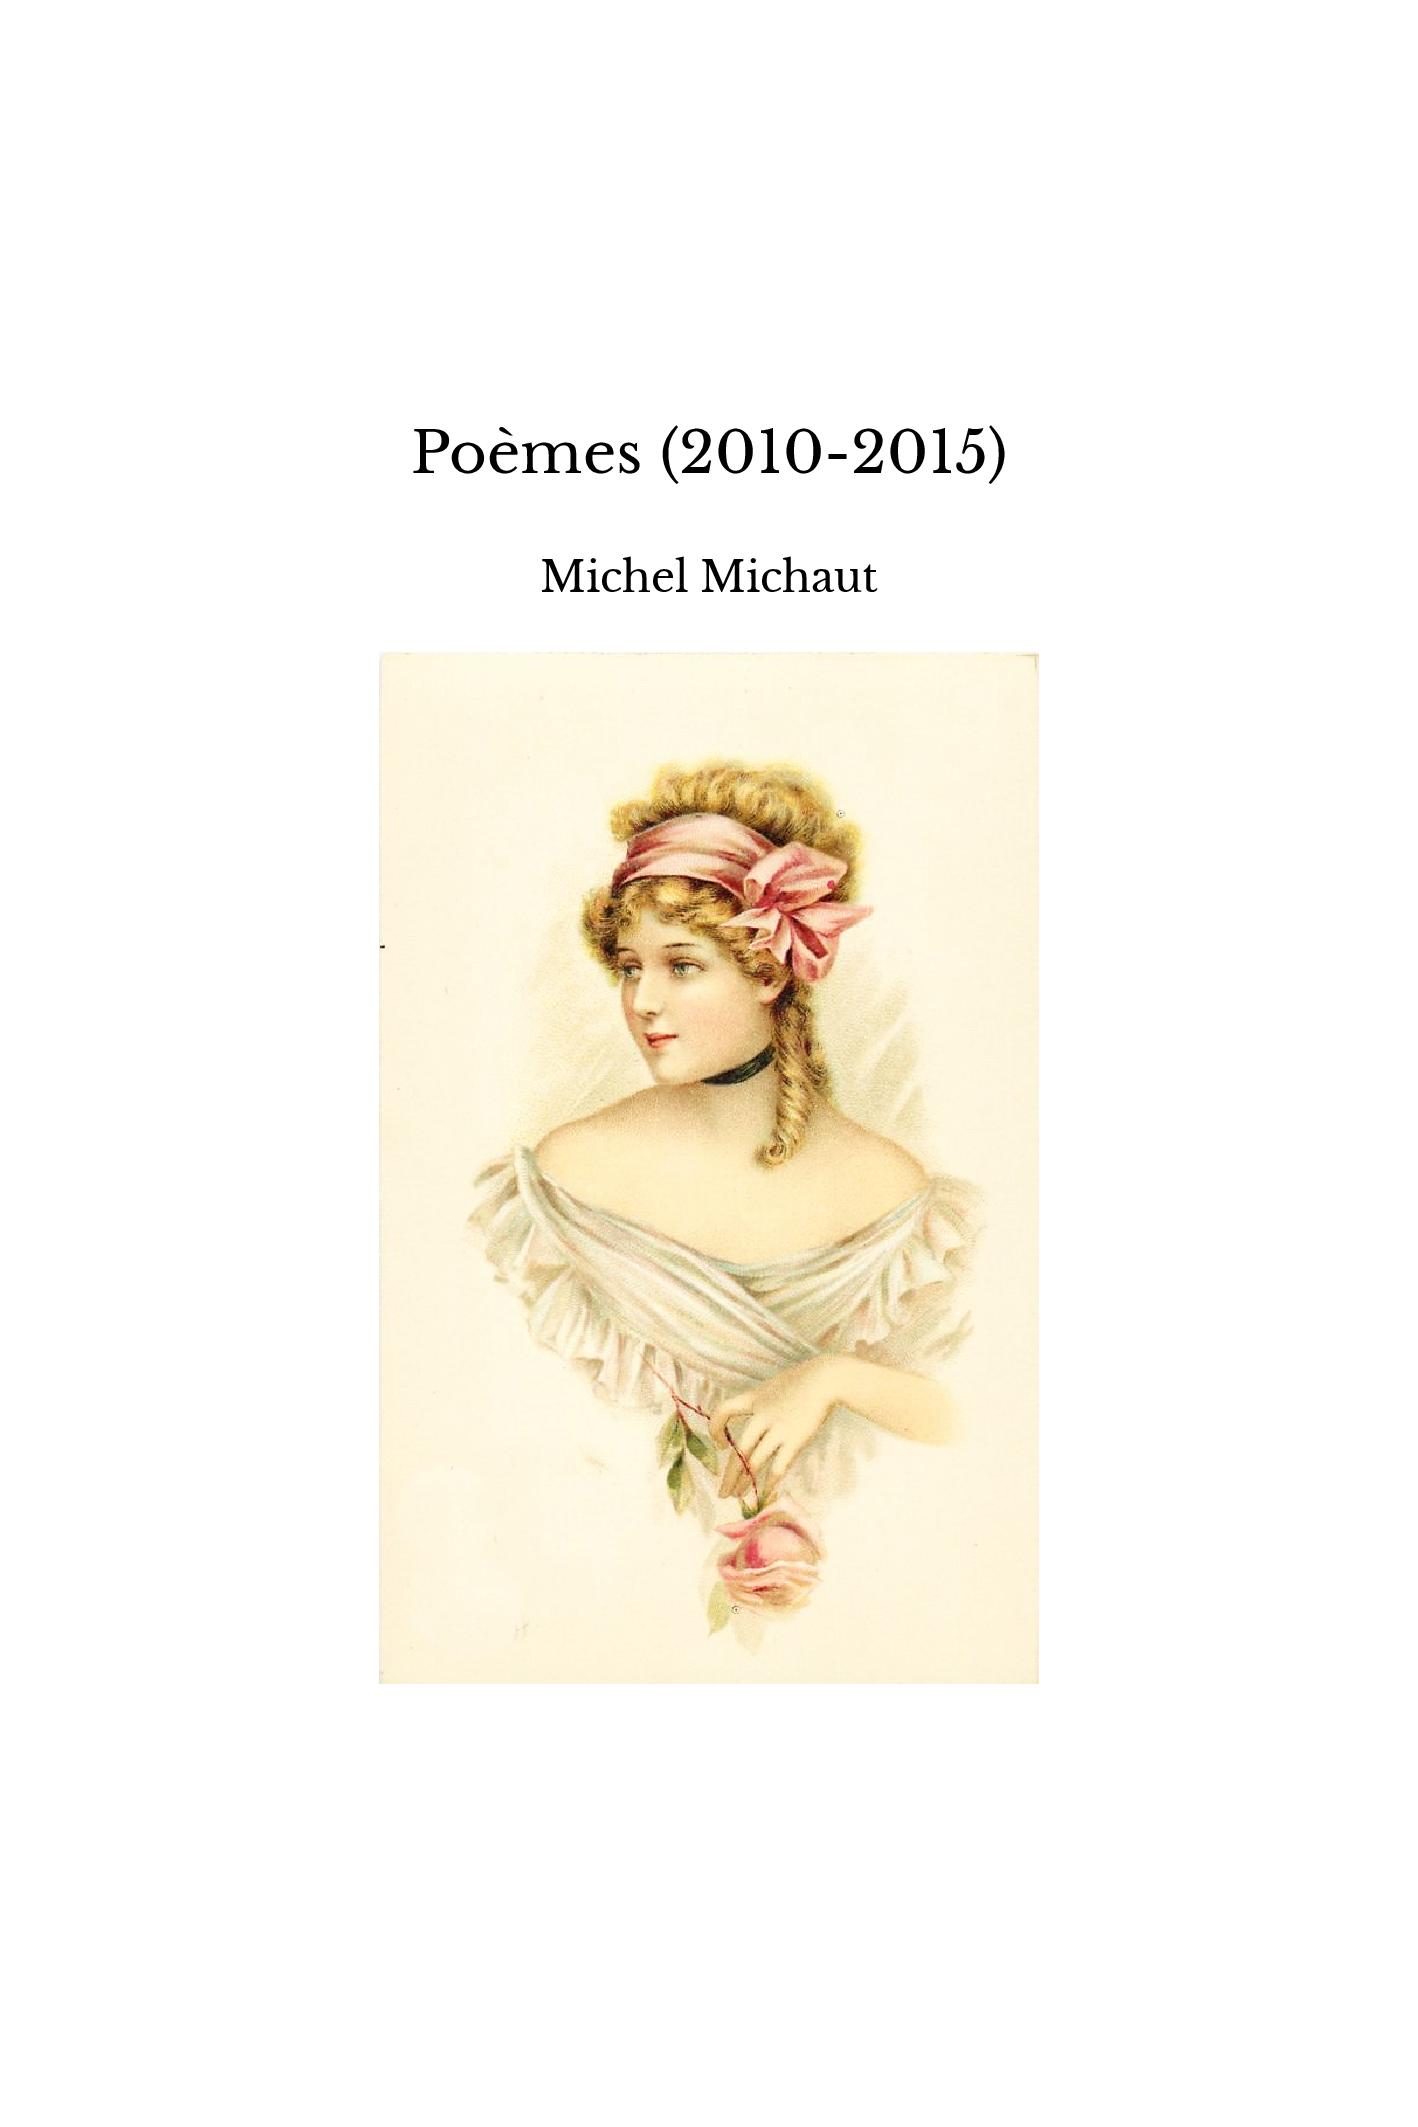 Poèmes (2010-2015)